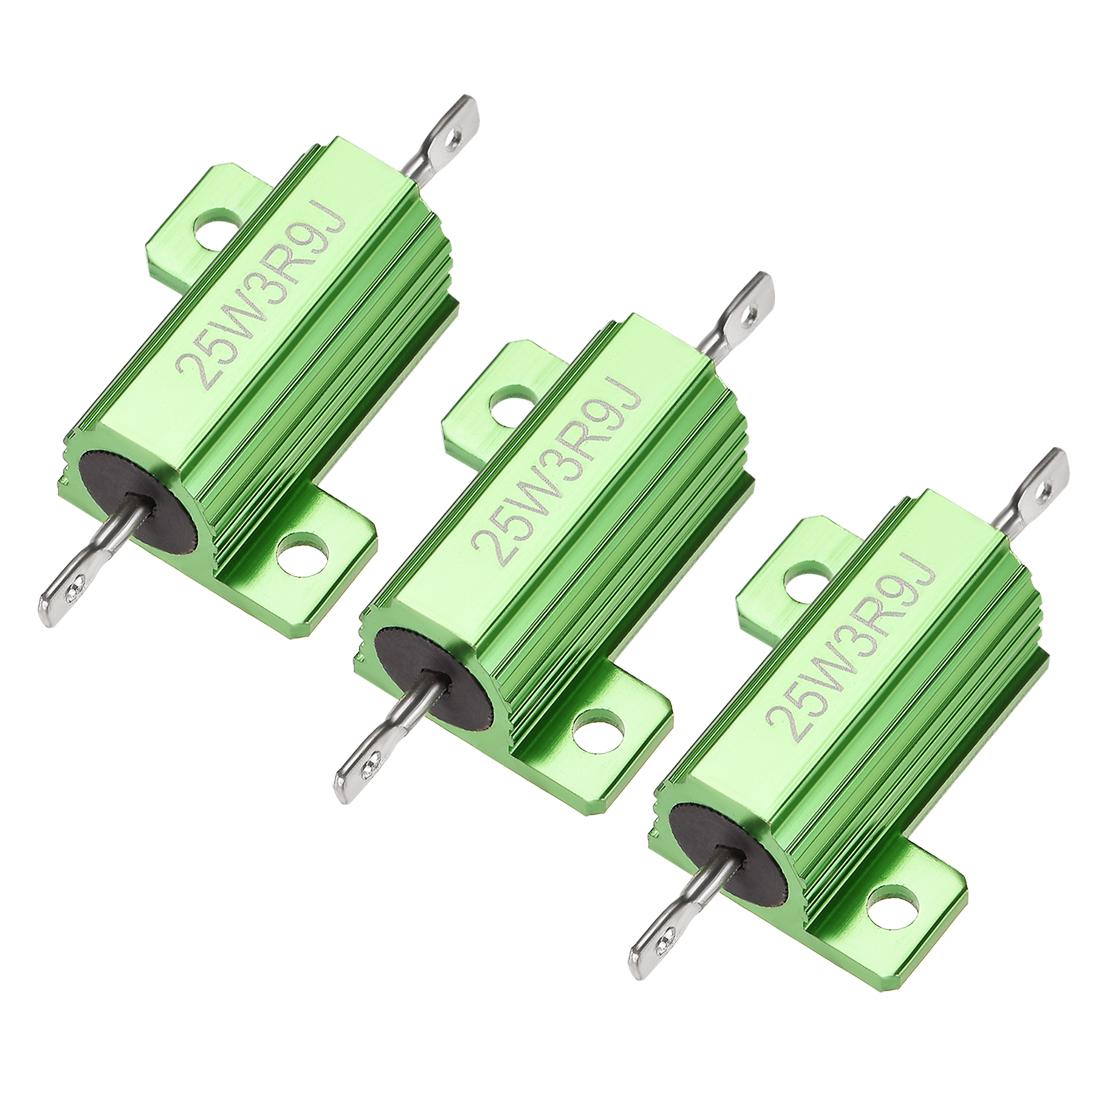 25W 3.9 Ohm 5% Aluminum Housing Resistor Wirewound Resistor Green Tone 3 Pcs